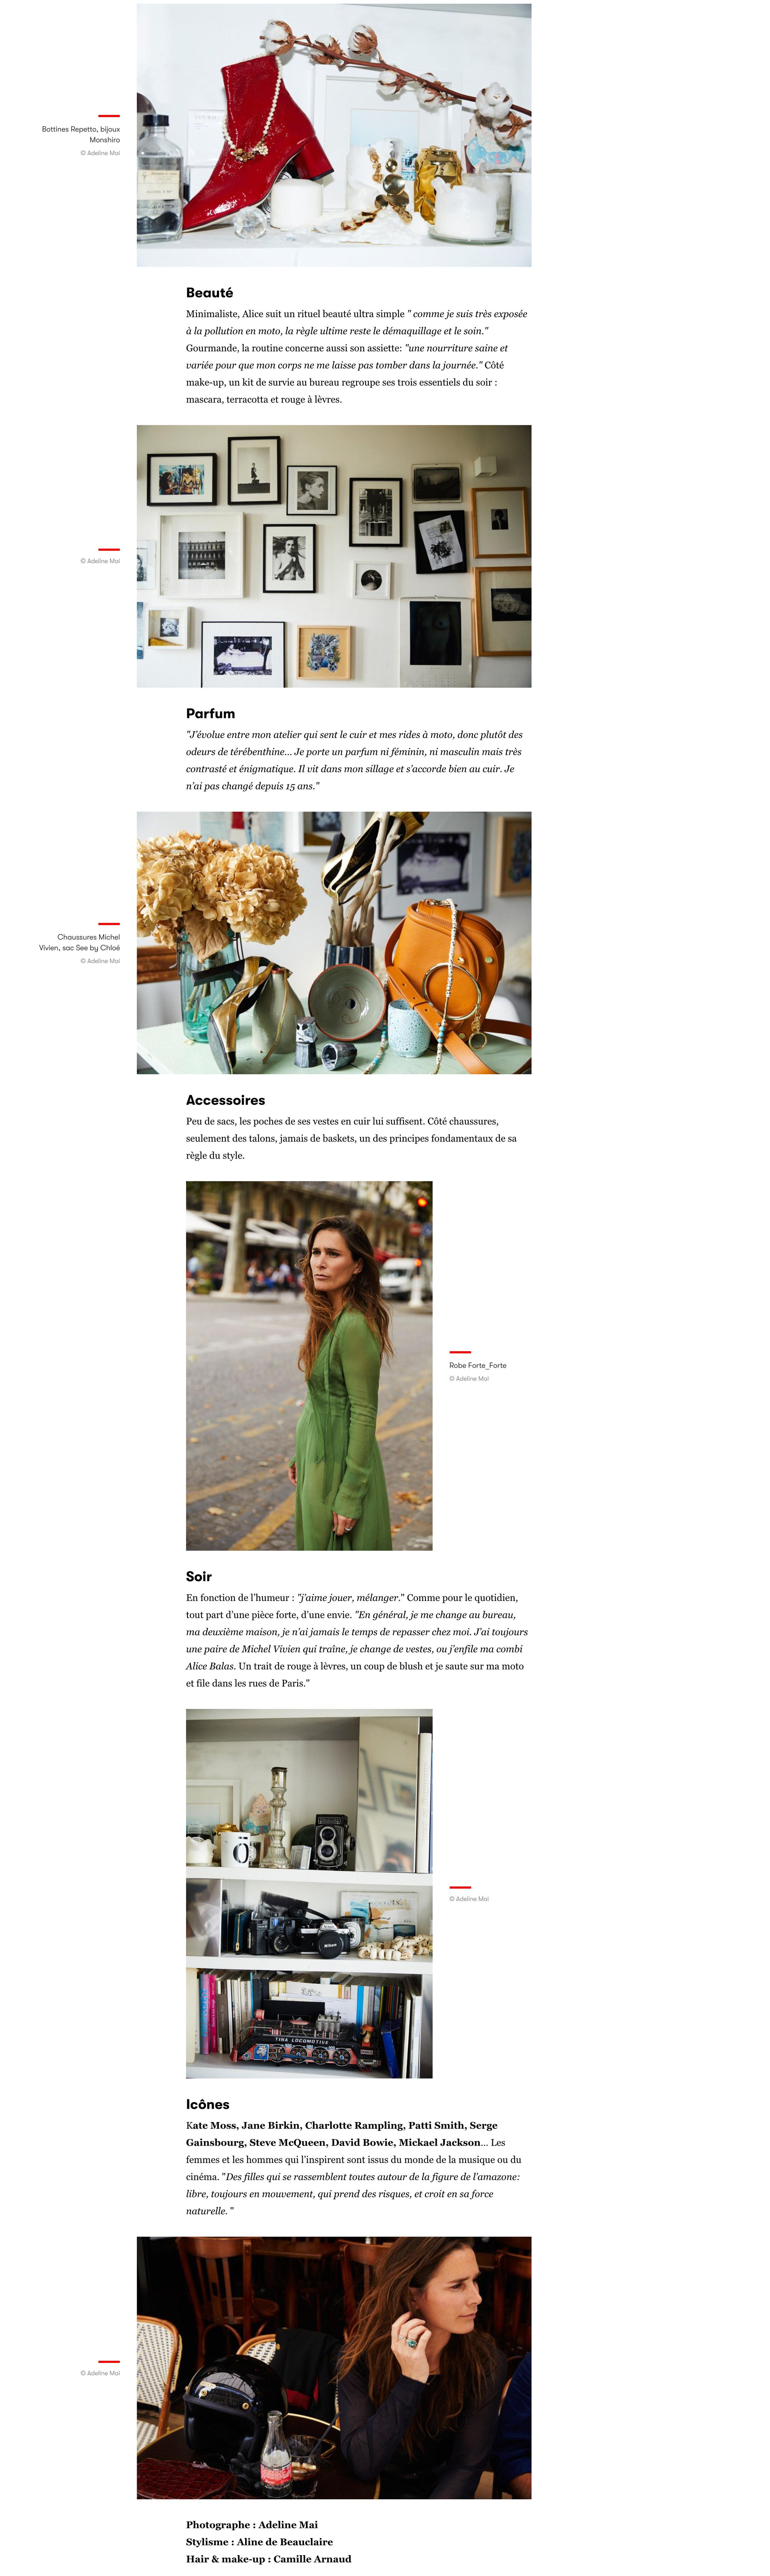 Capture page 2.jpg